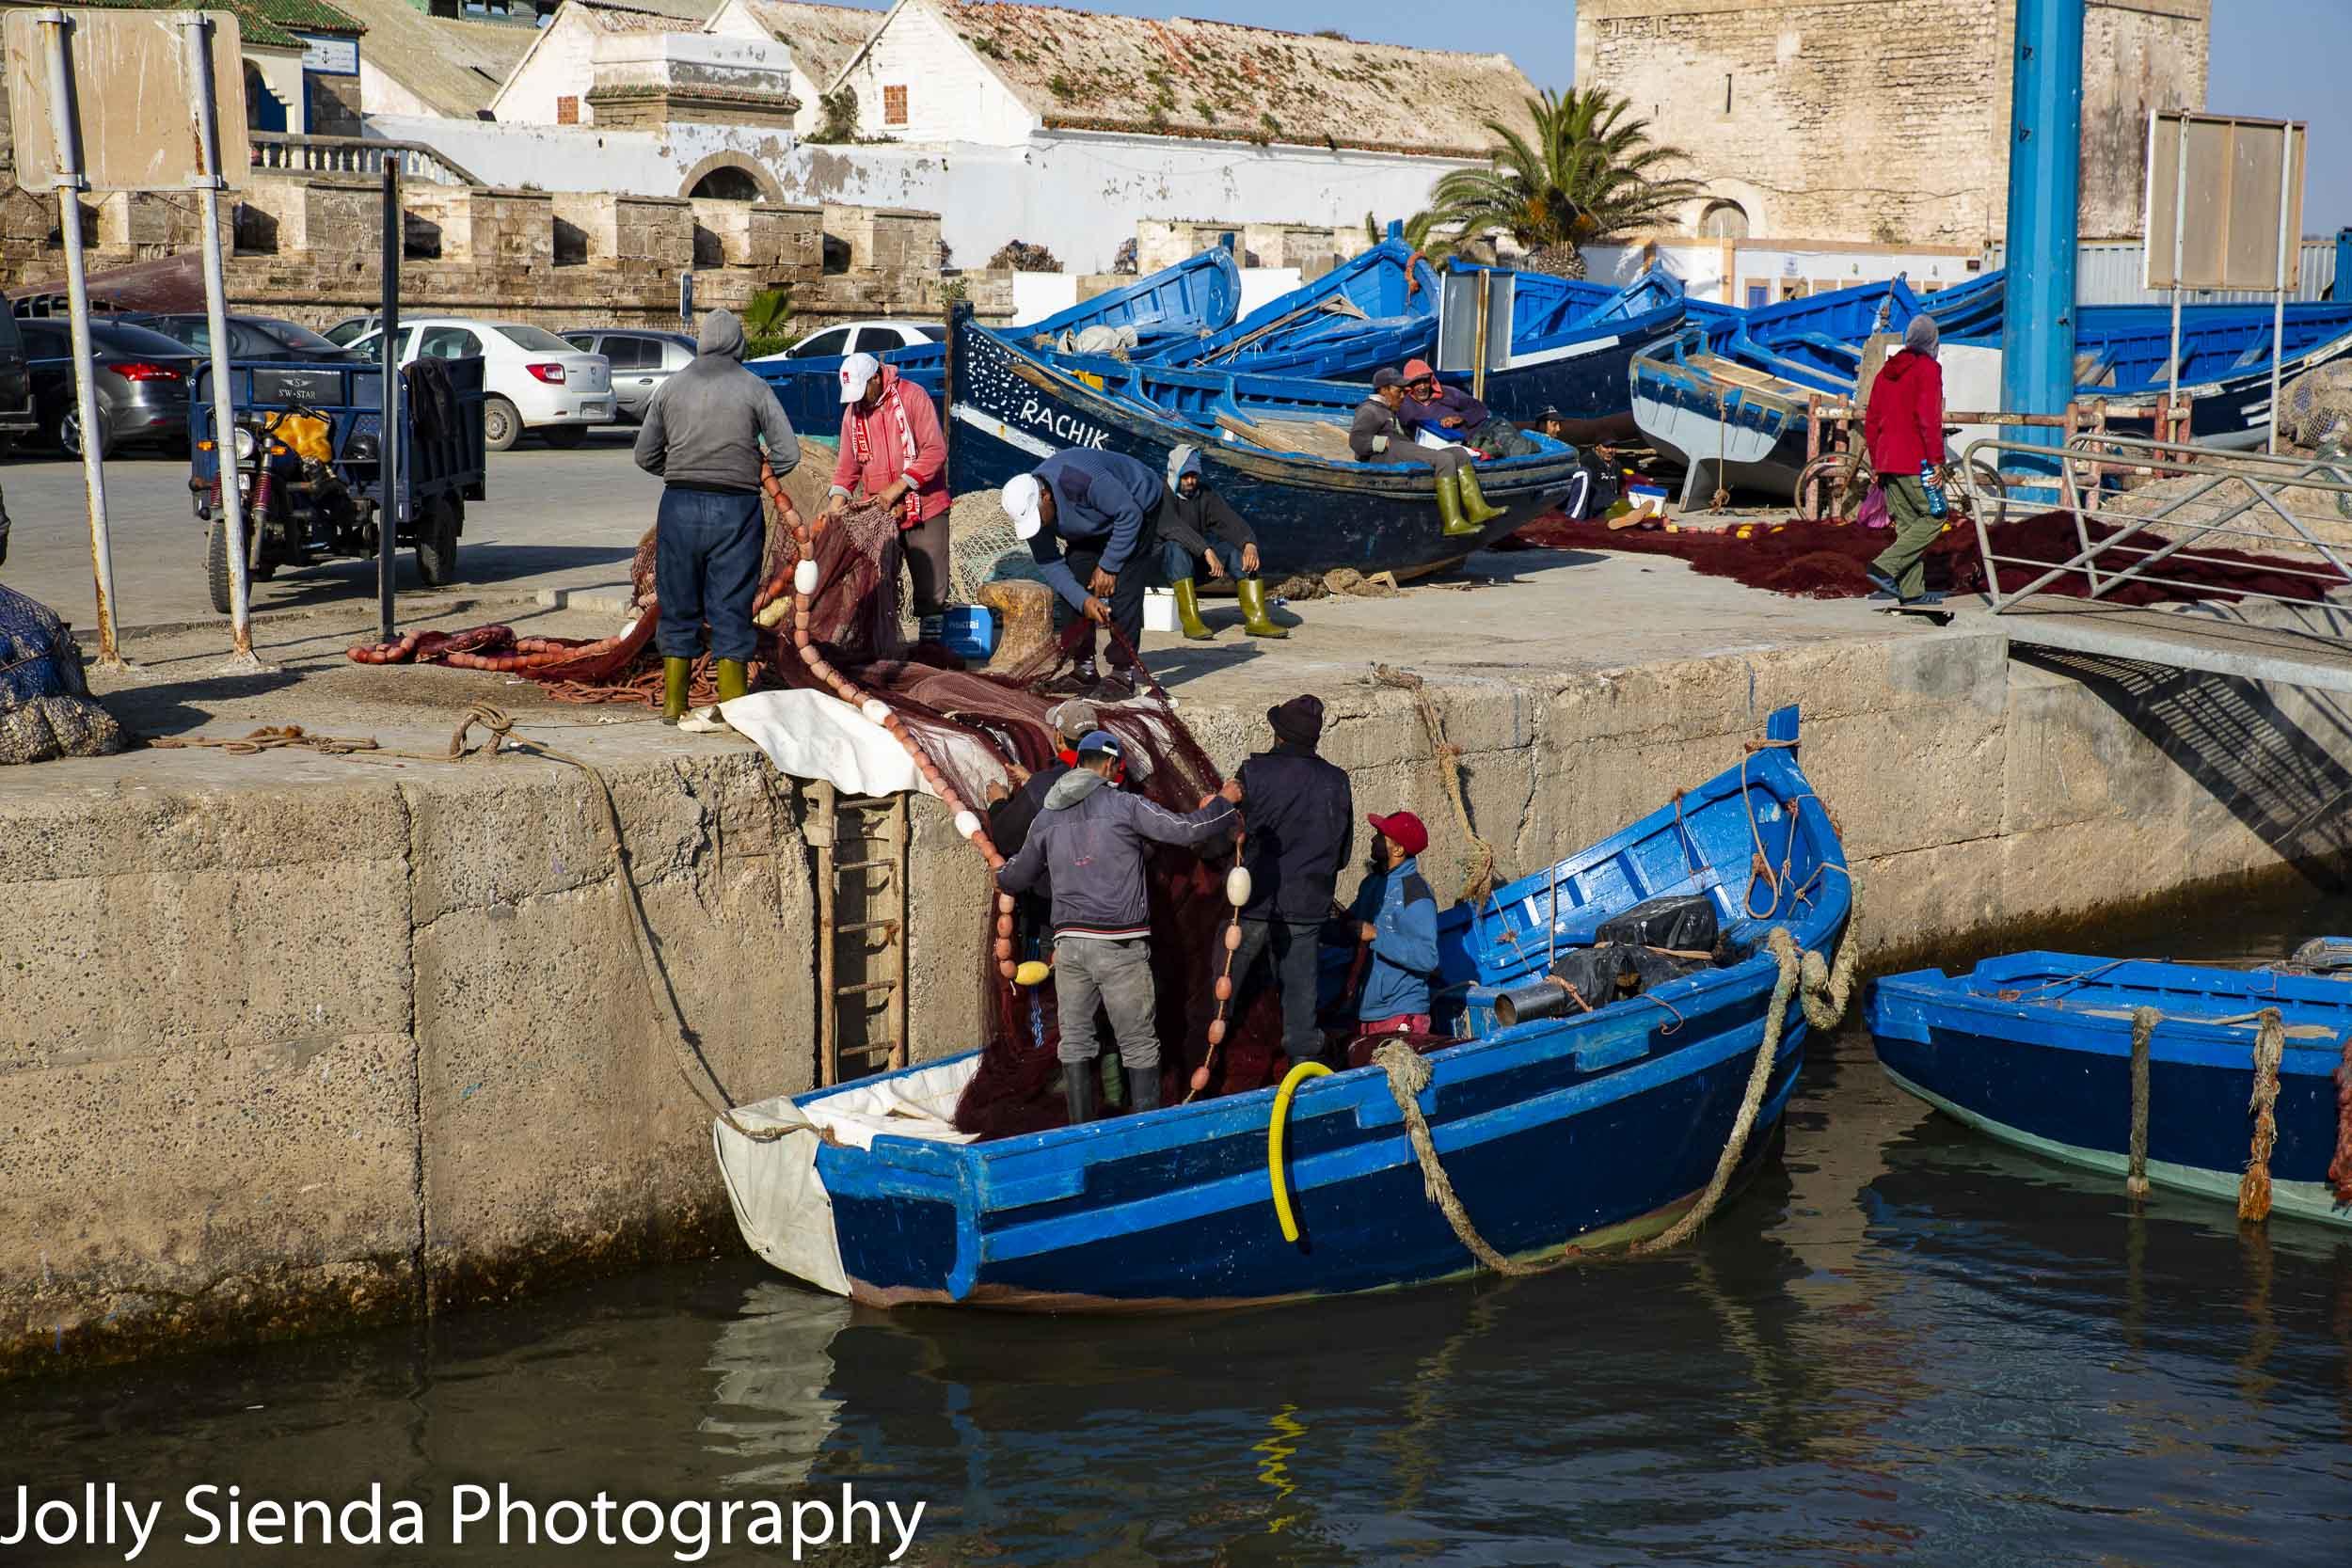 Fishermen hoist nets into the wooden boats